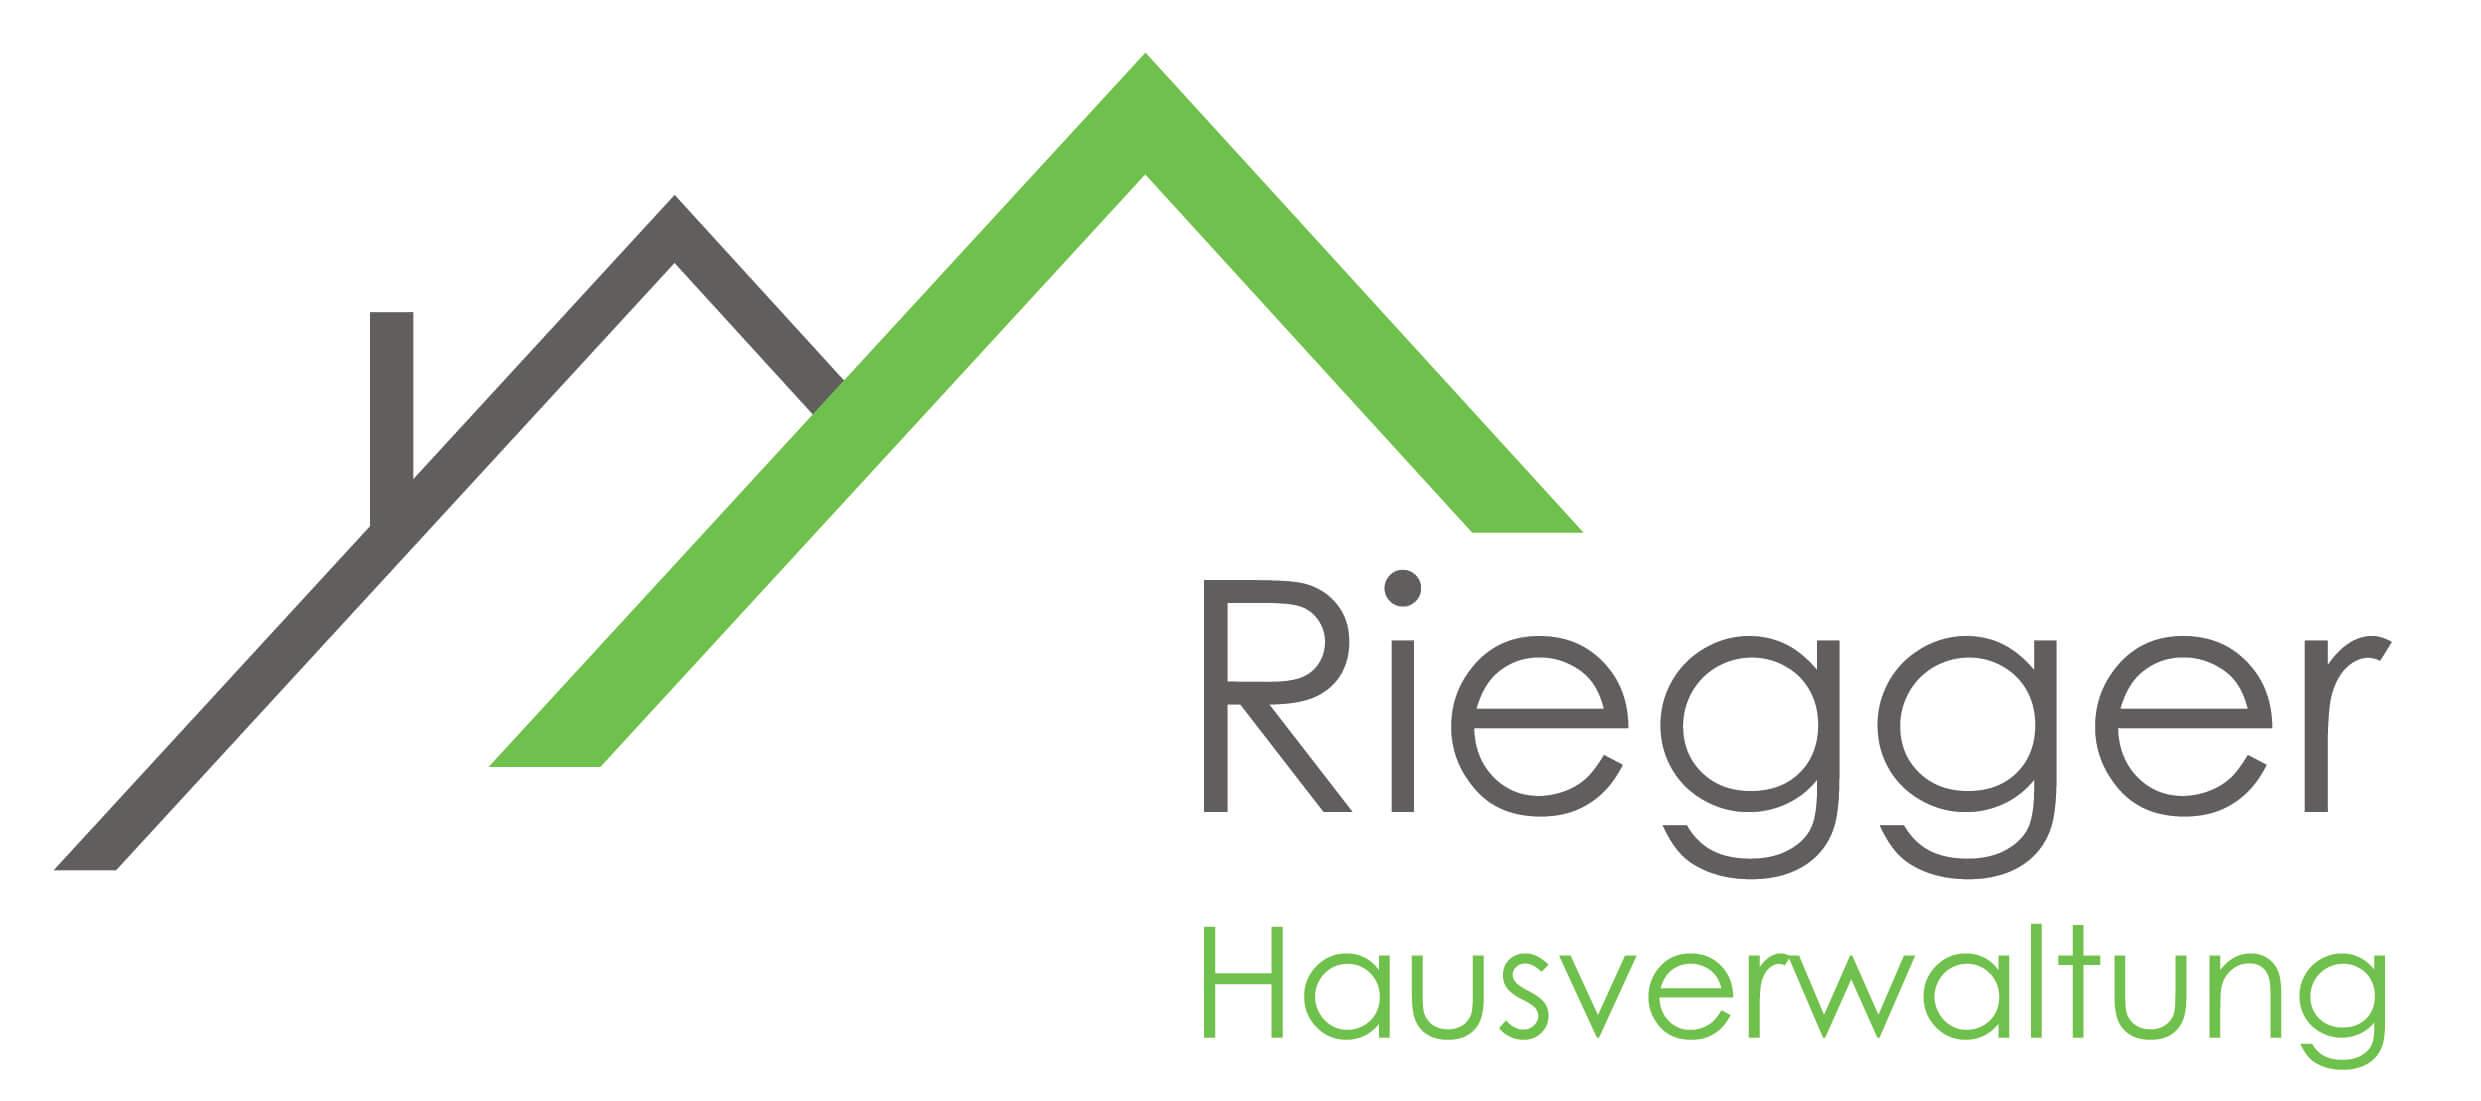 Riegger Hausverwaltung